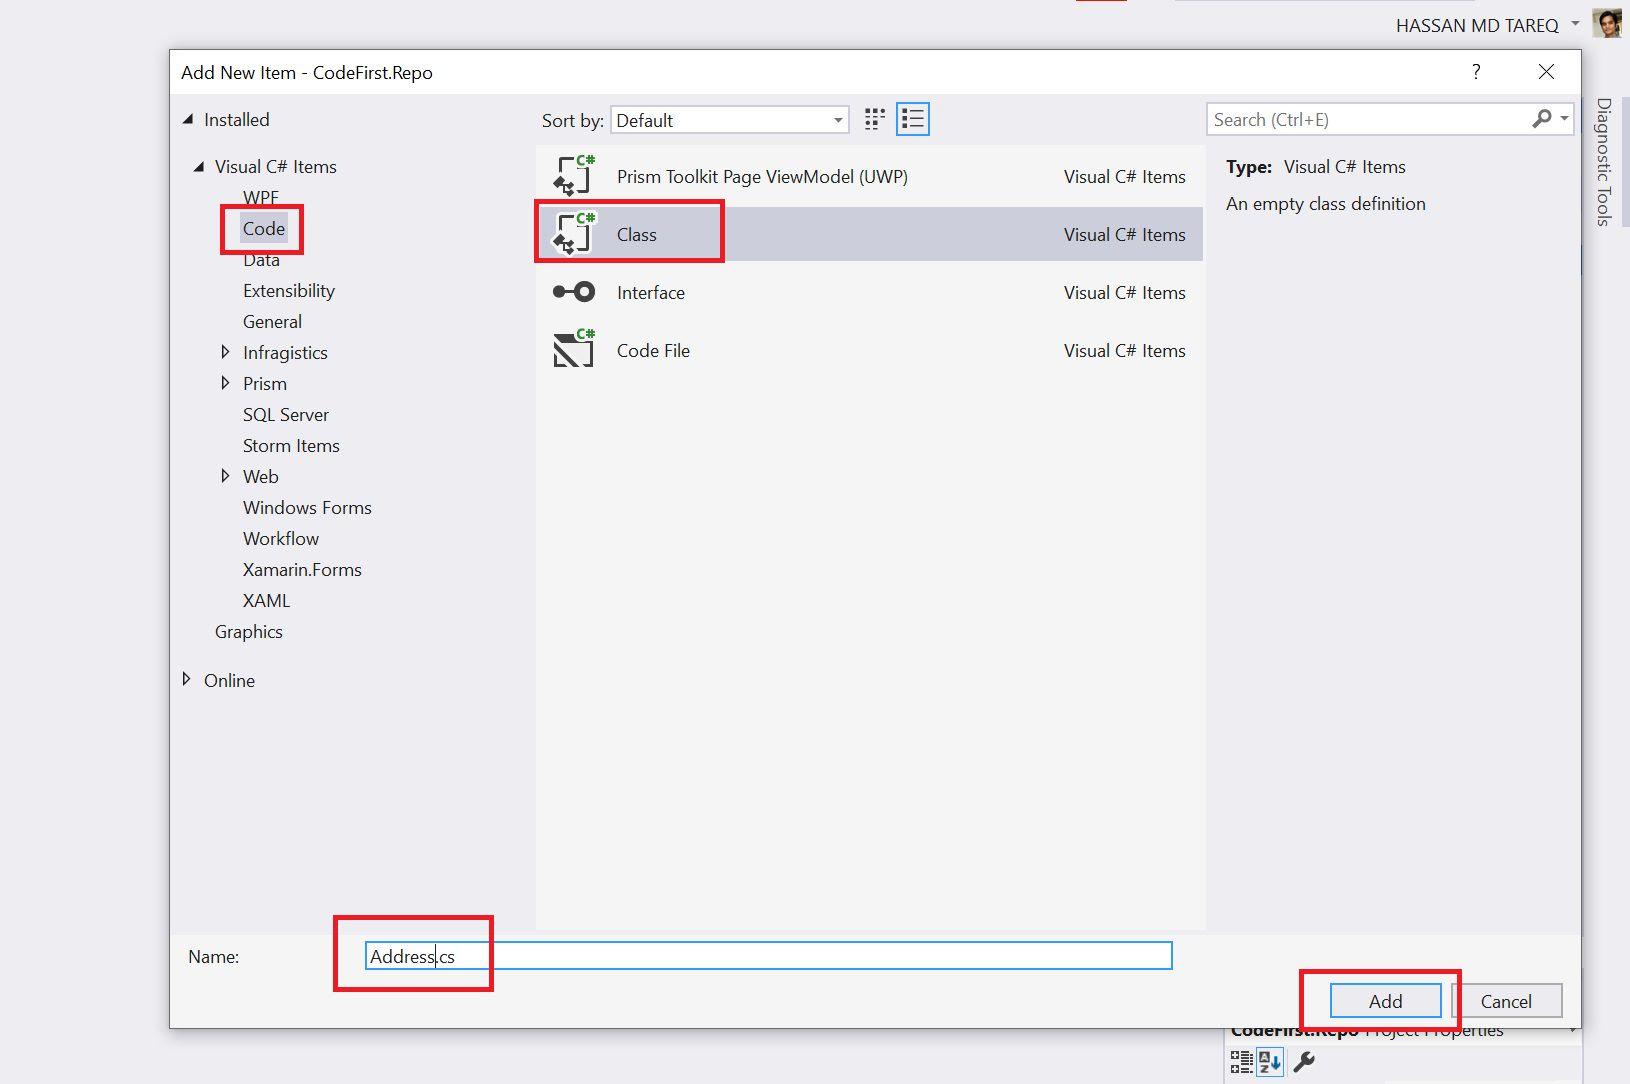 Entity Framework Code Fisrt Approach - Creating edmx from DbContext Step 6